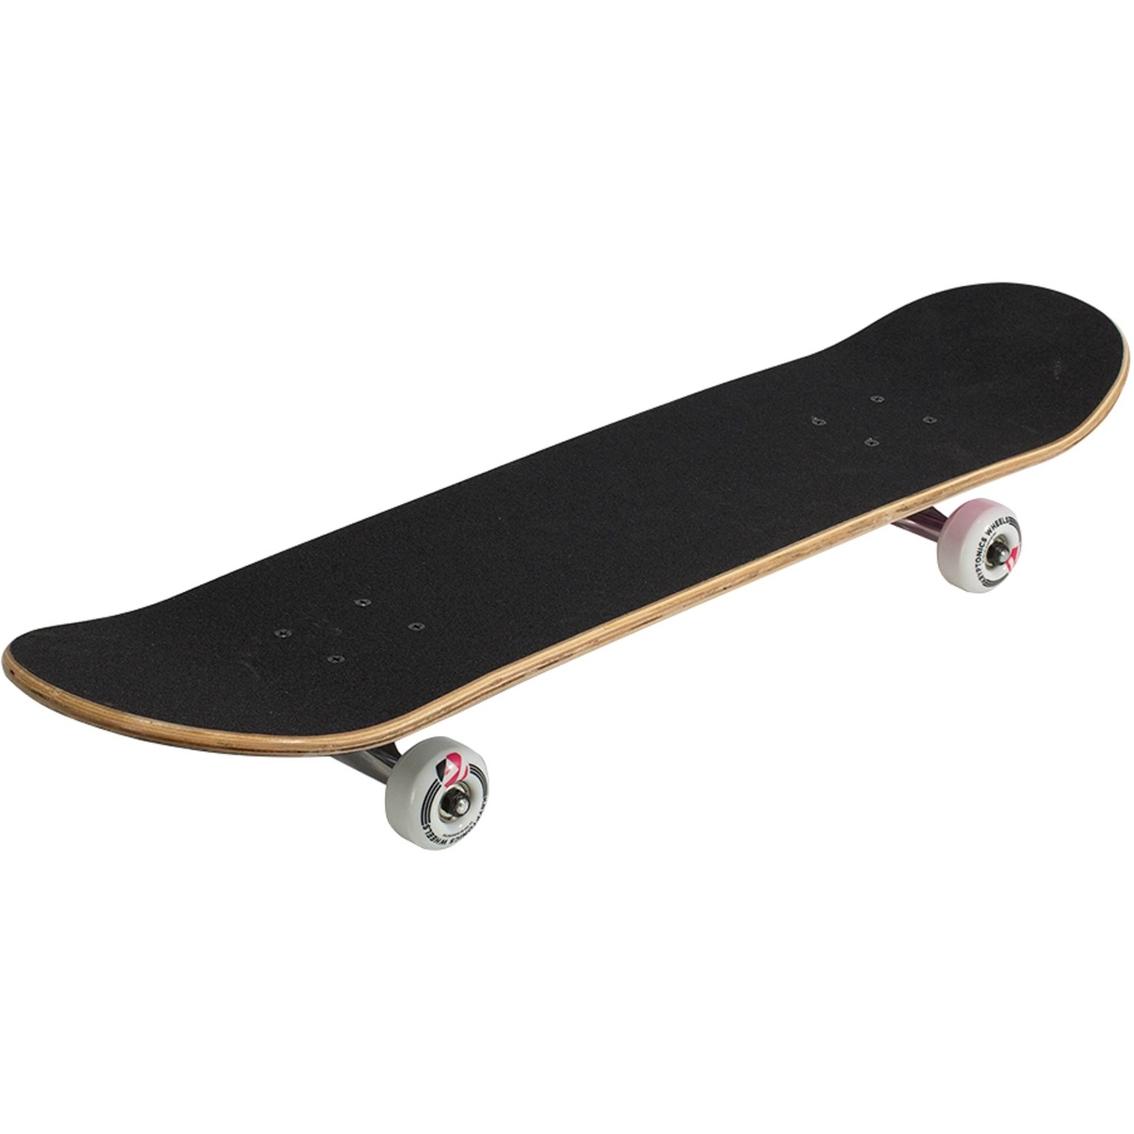 45344048fb Kryptonics Drop-In Series 31 In. Complete Skateboard, Sealed Pink Graphic